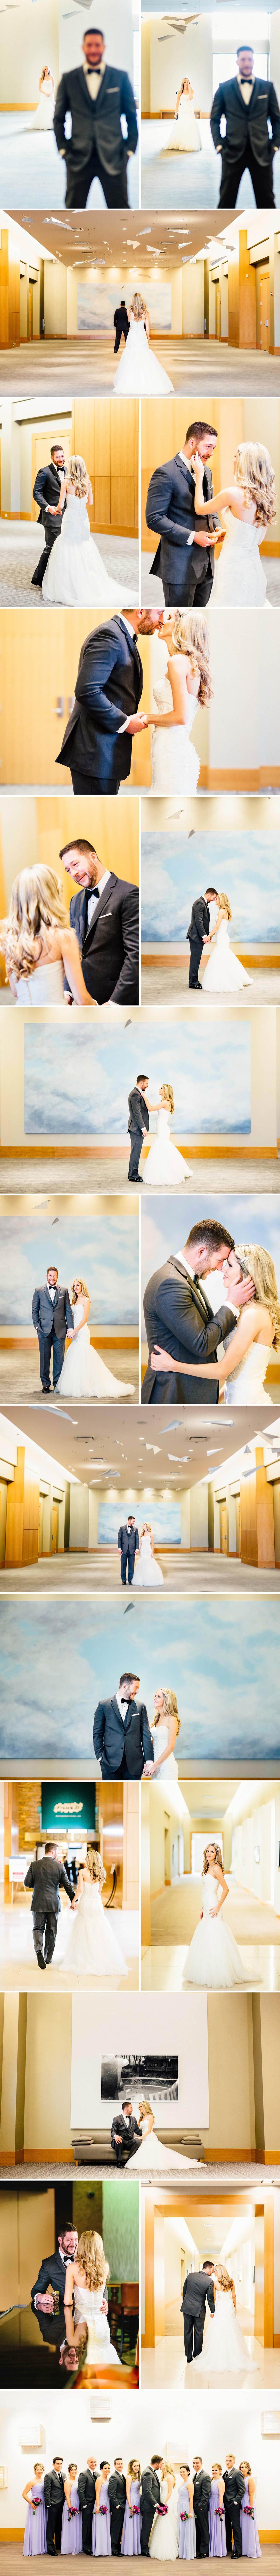 chicago-fine-art-wedding-photography-gorsky5